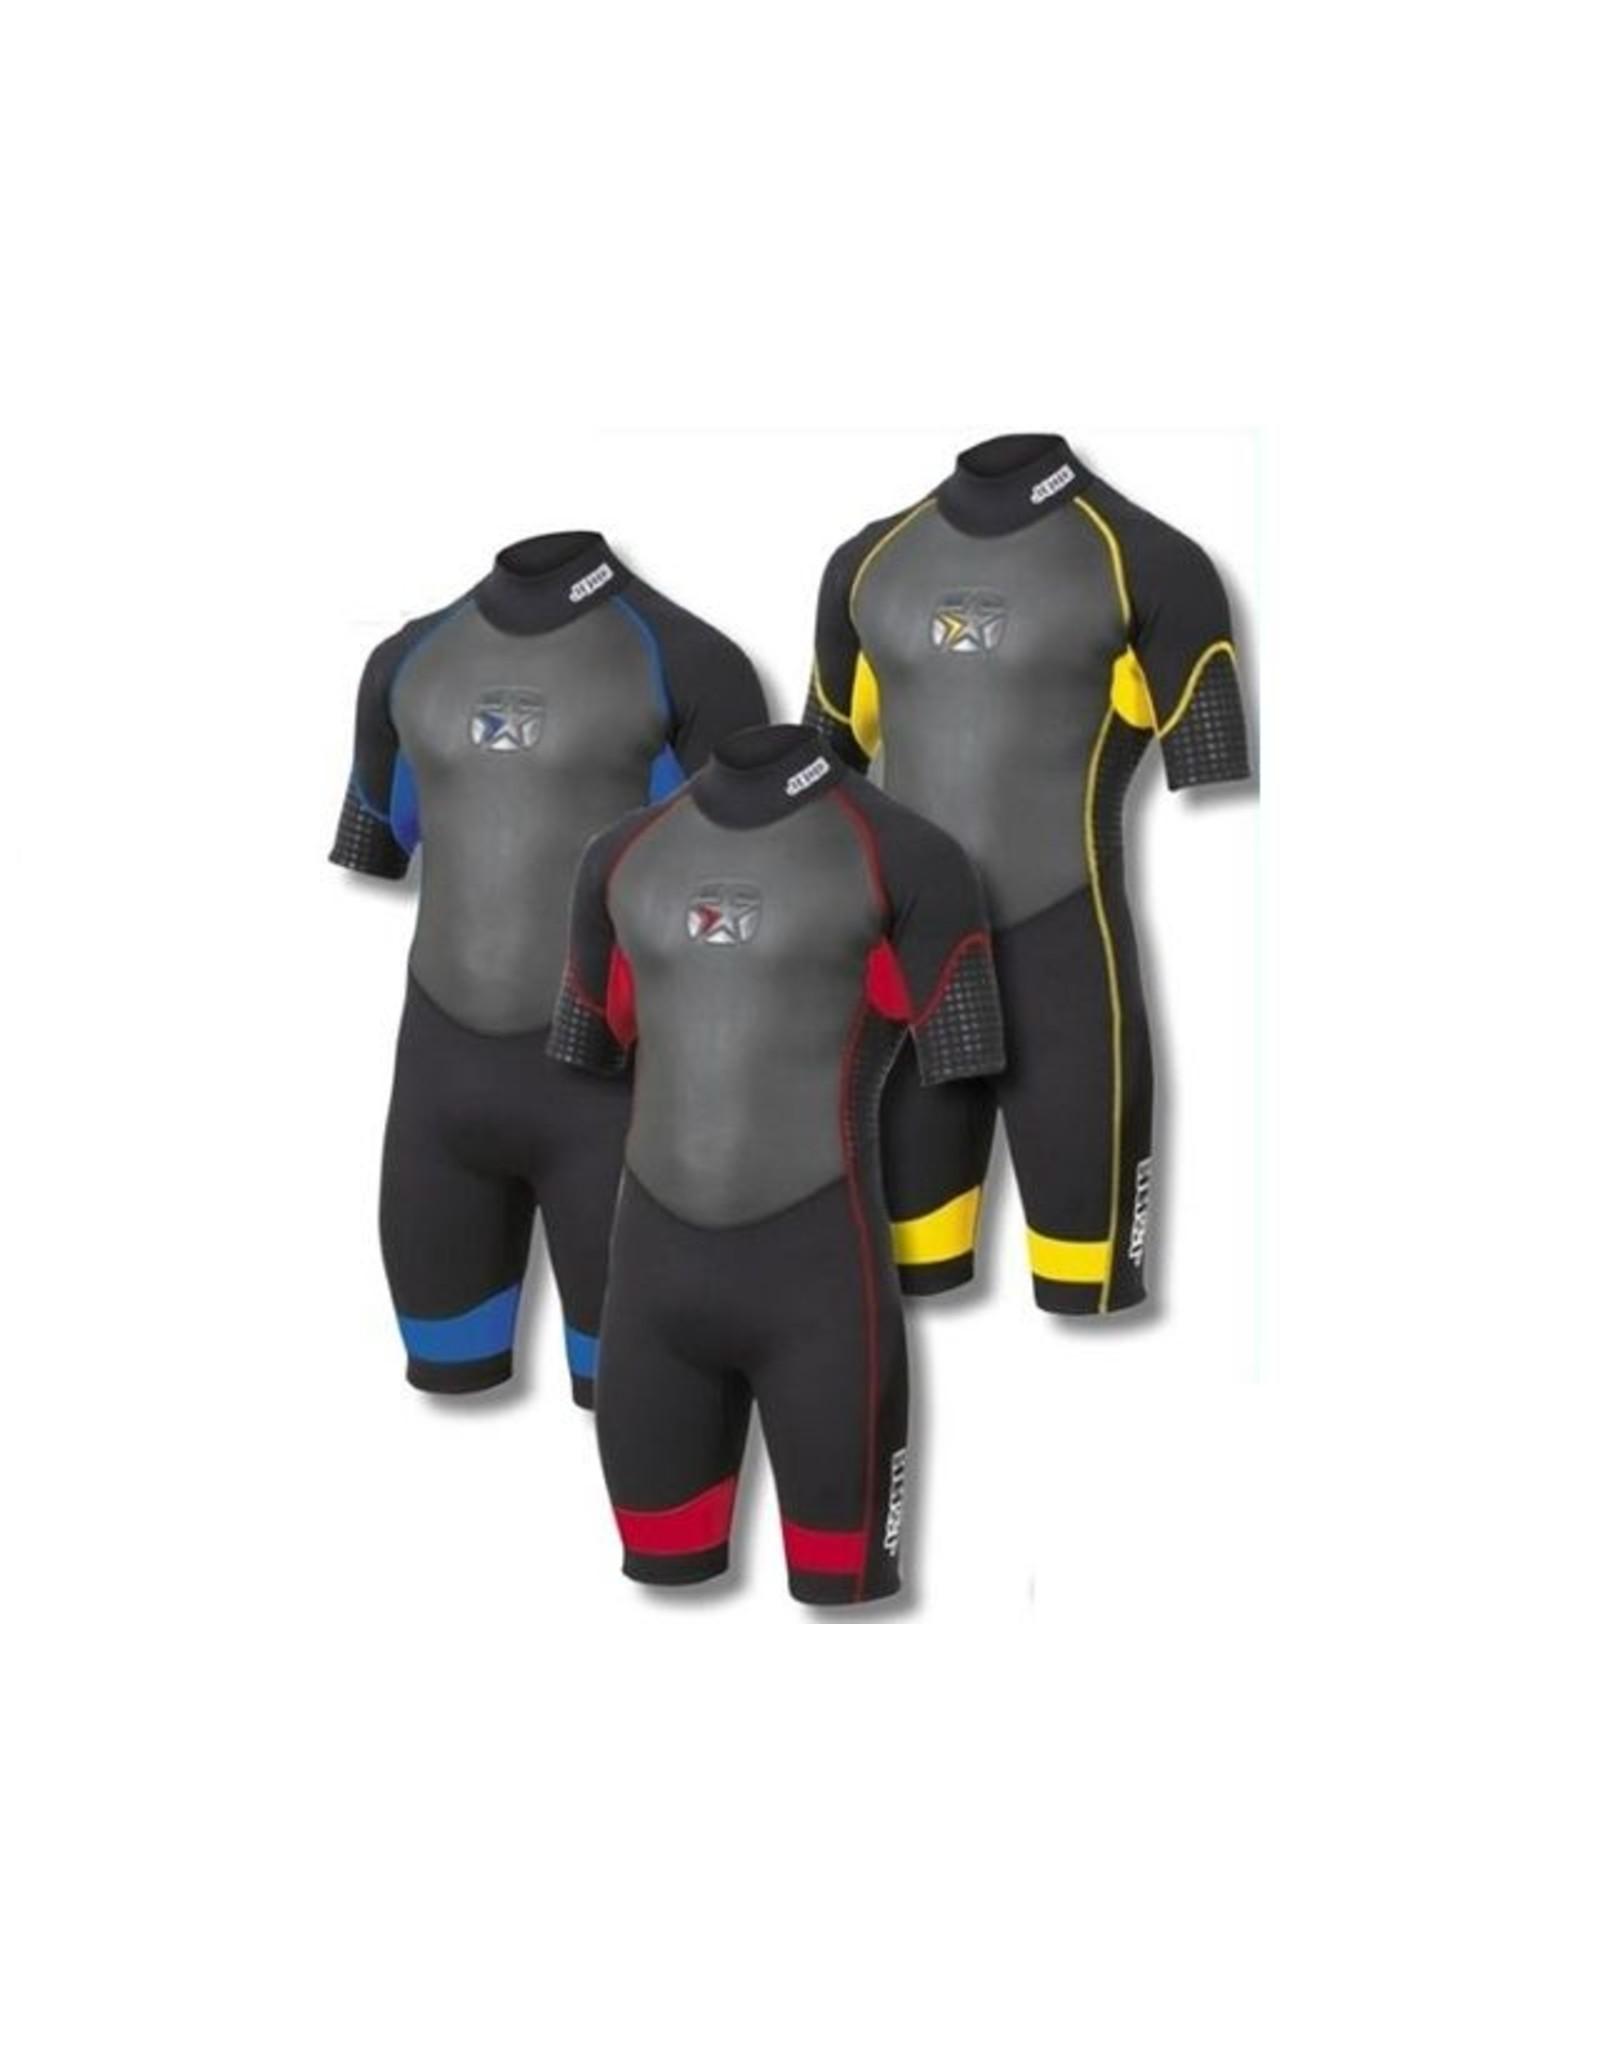 Hebor Watersport Jobe Shorty Extra wetsuit - 3